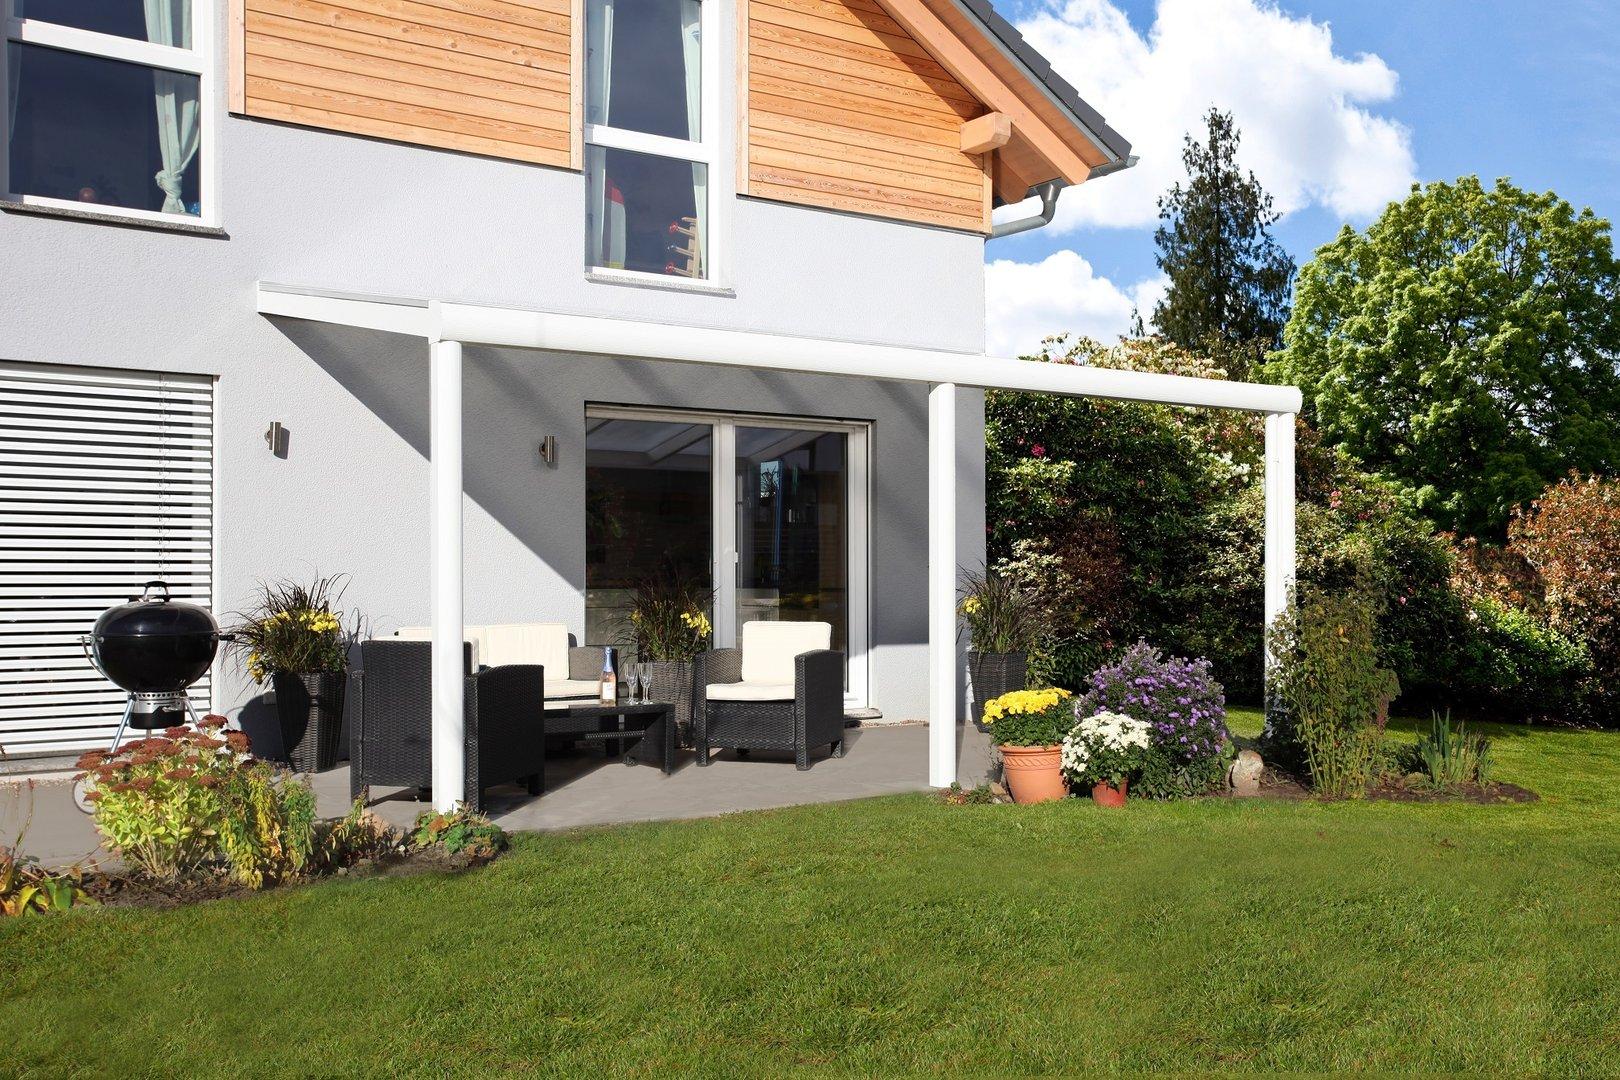 Terrassenüberdachung Garda 7 - Alu - Sams Gartenhaus Shop